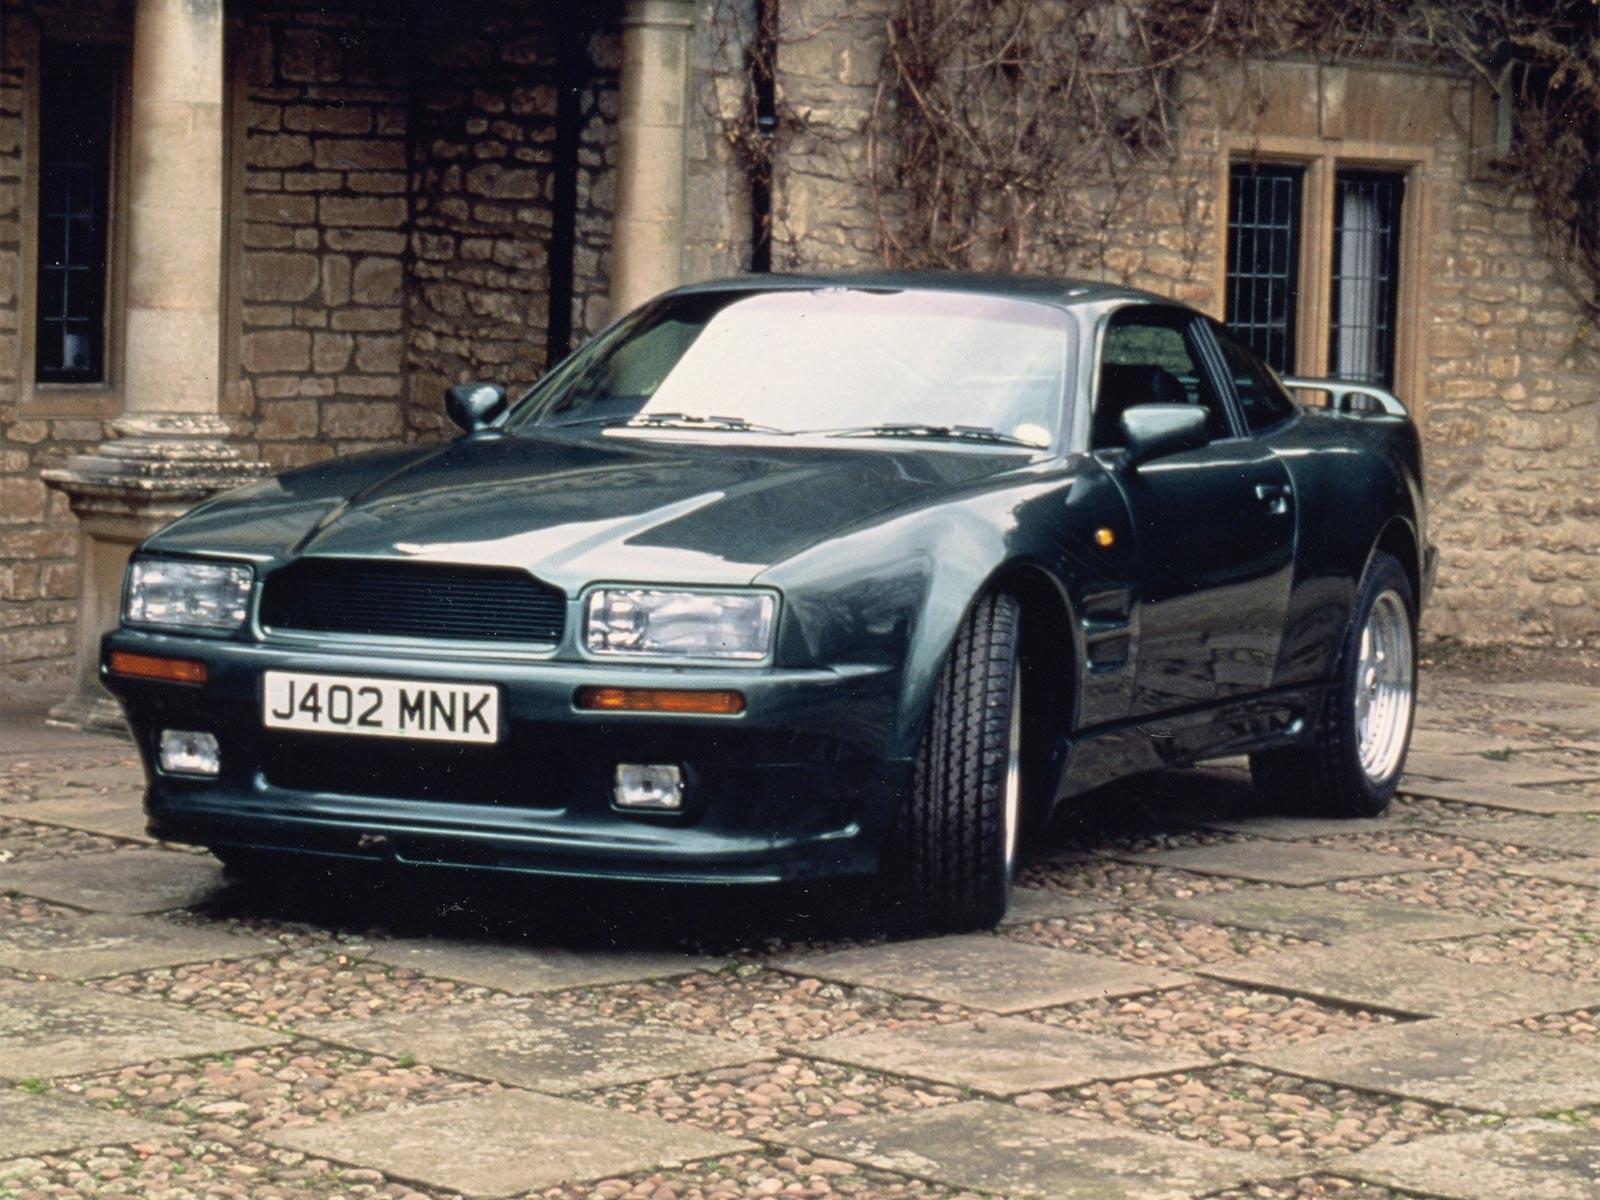 Aston Martin Virage Saloon 5 3 I V8 32v 335 Hp